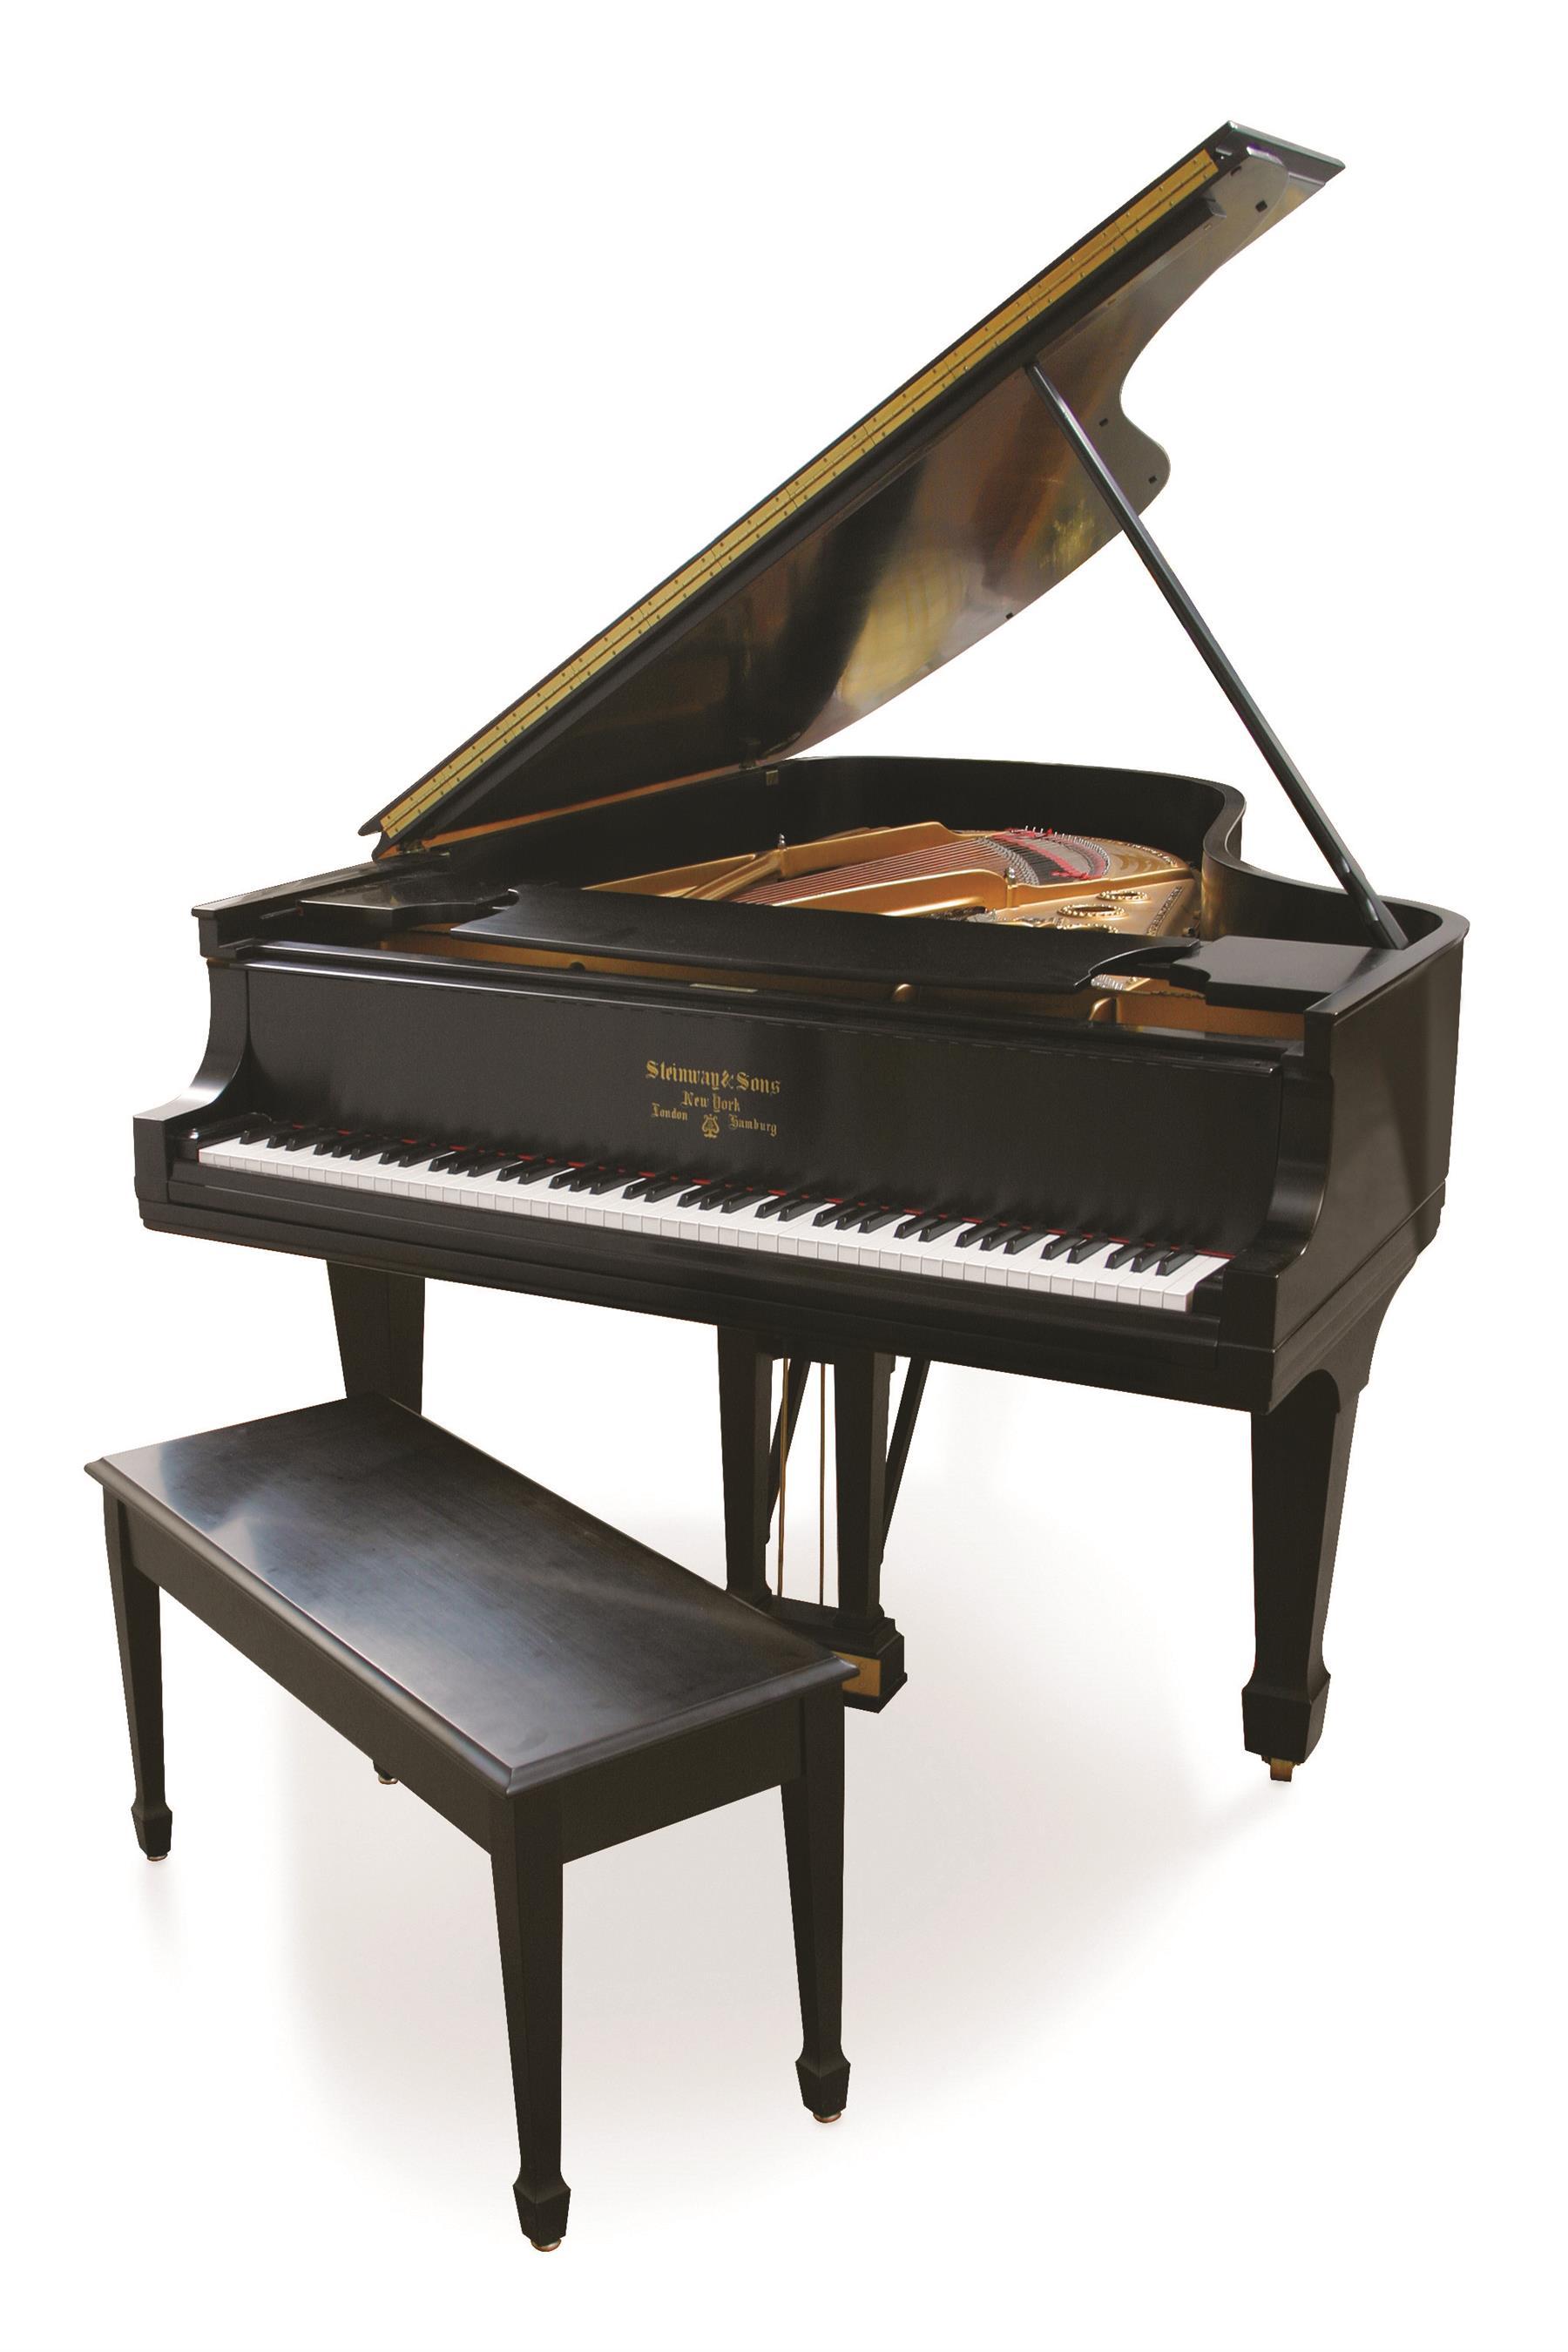 1929 STEINWAY PIANO MODEL B.